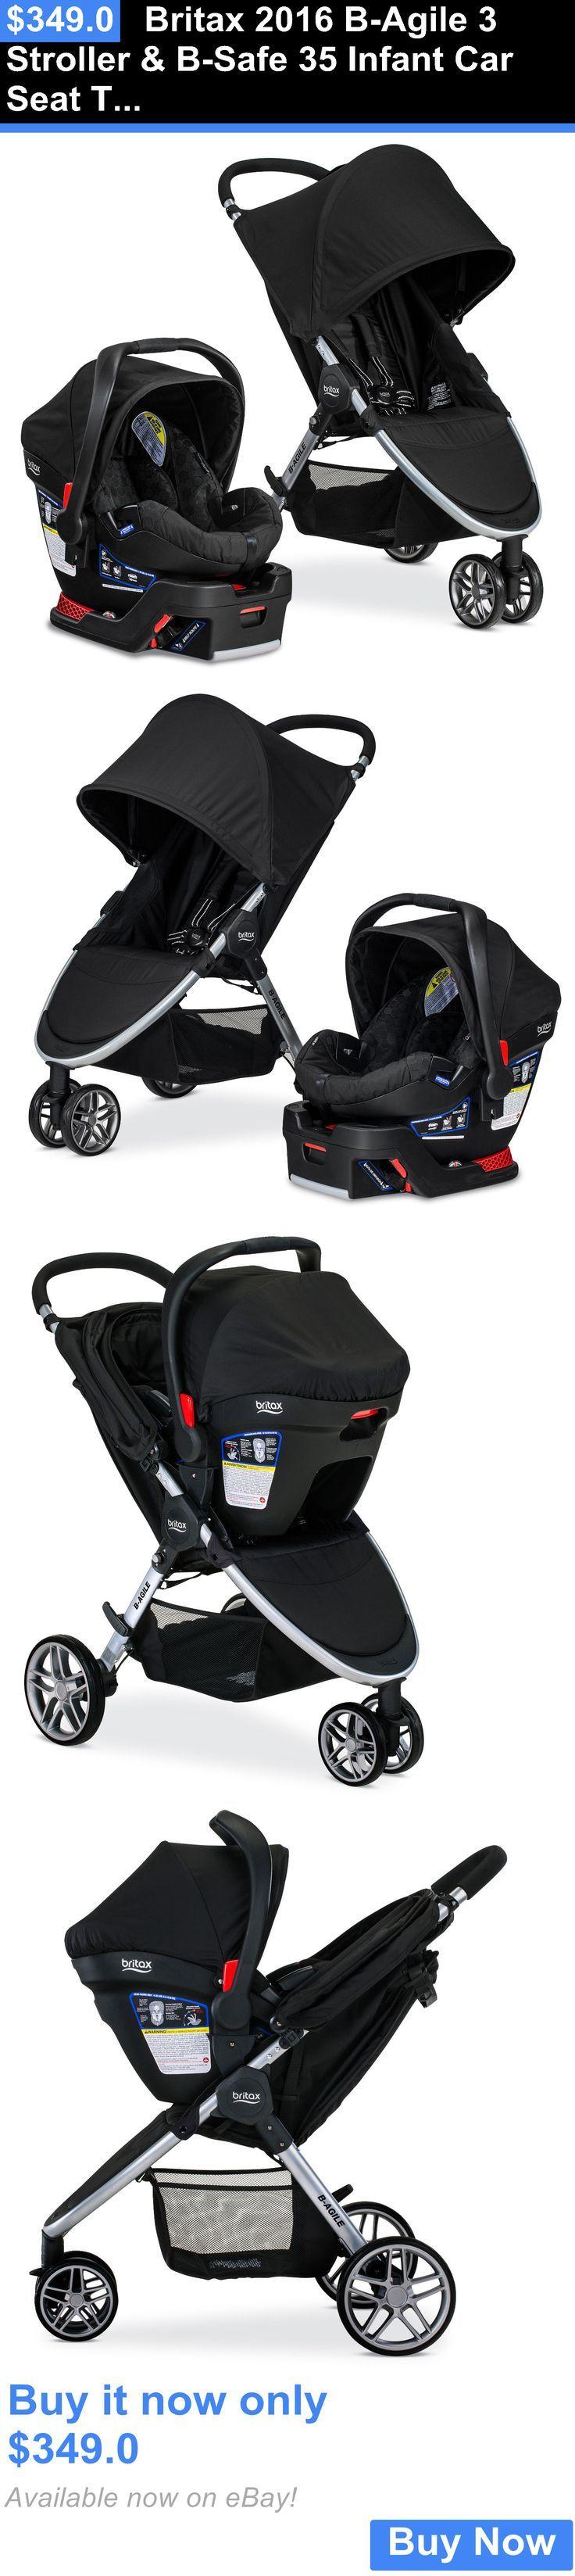 Baby Britax 2016 BAgile 3 Stroller And BSafe 35 Infant